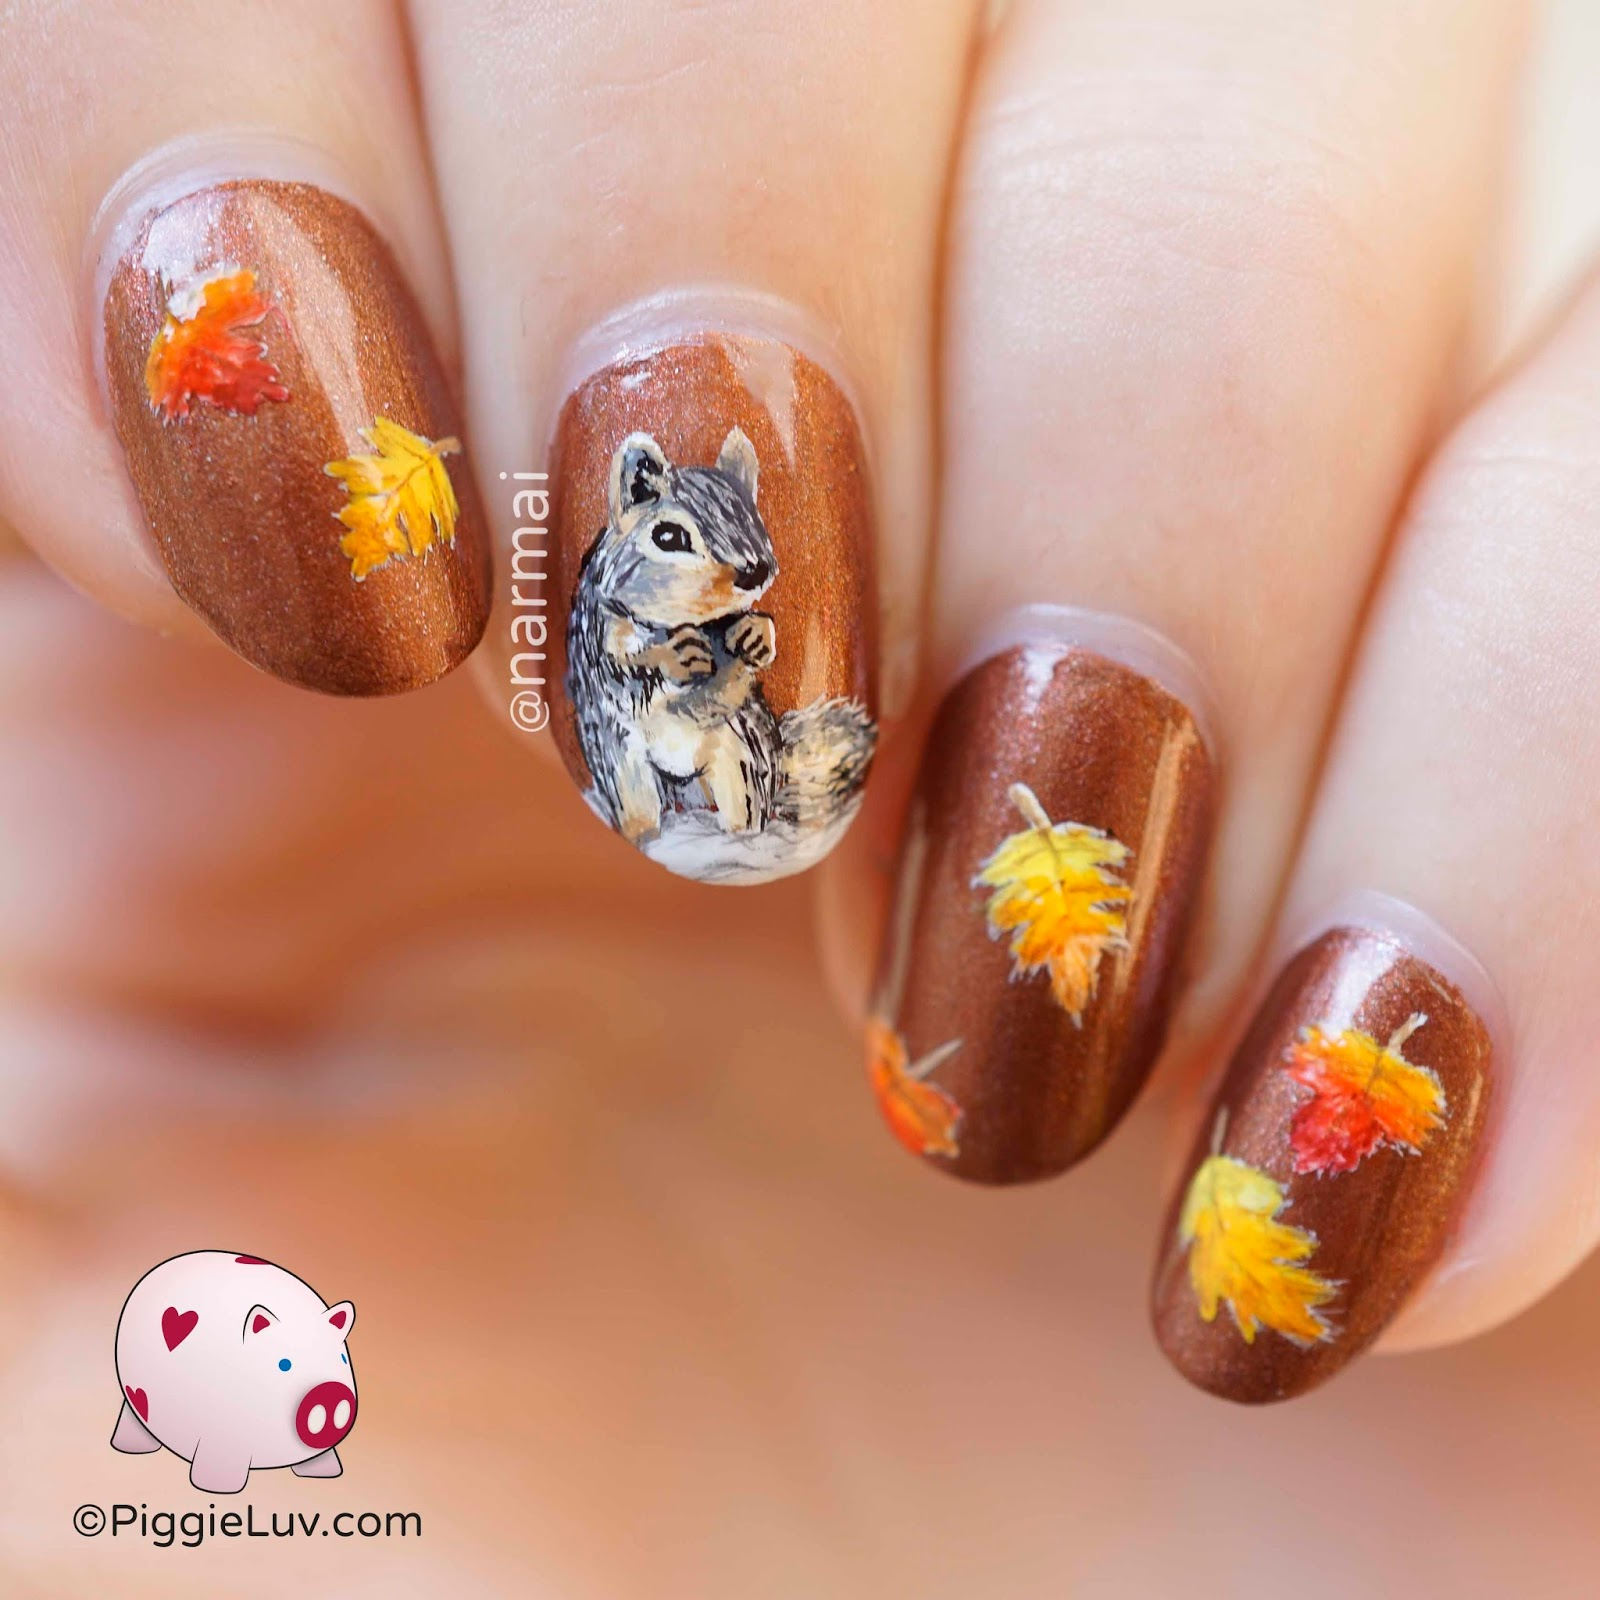 PiggieLuv: Autumn squirrel nail art